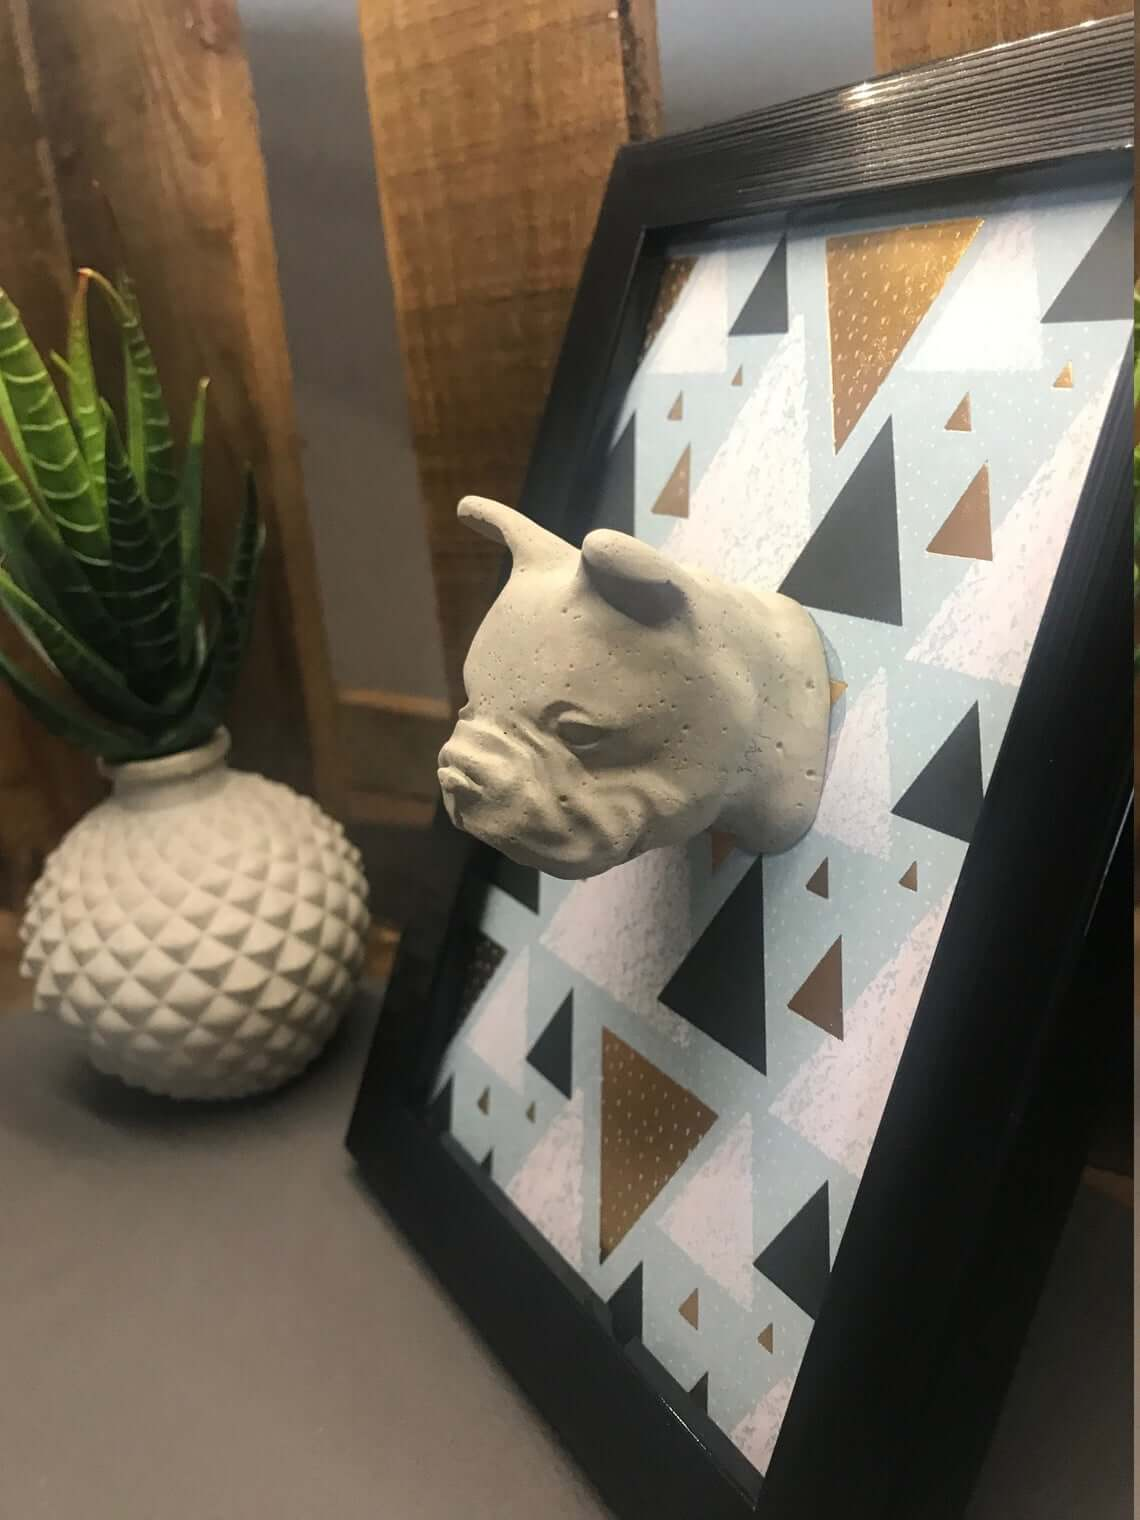 Stylish Three-Dimensional French Bulldog Picture